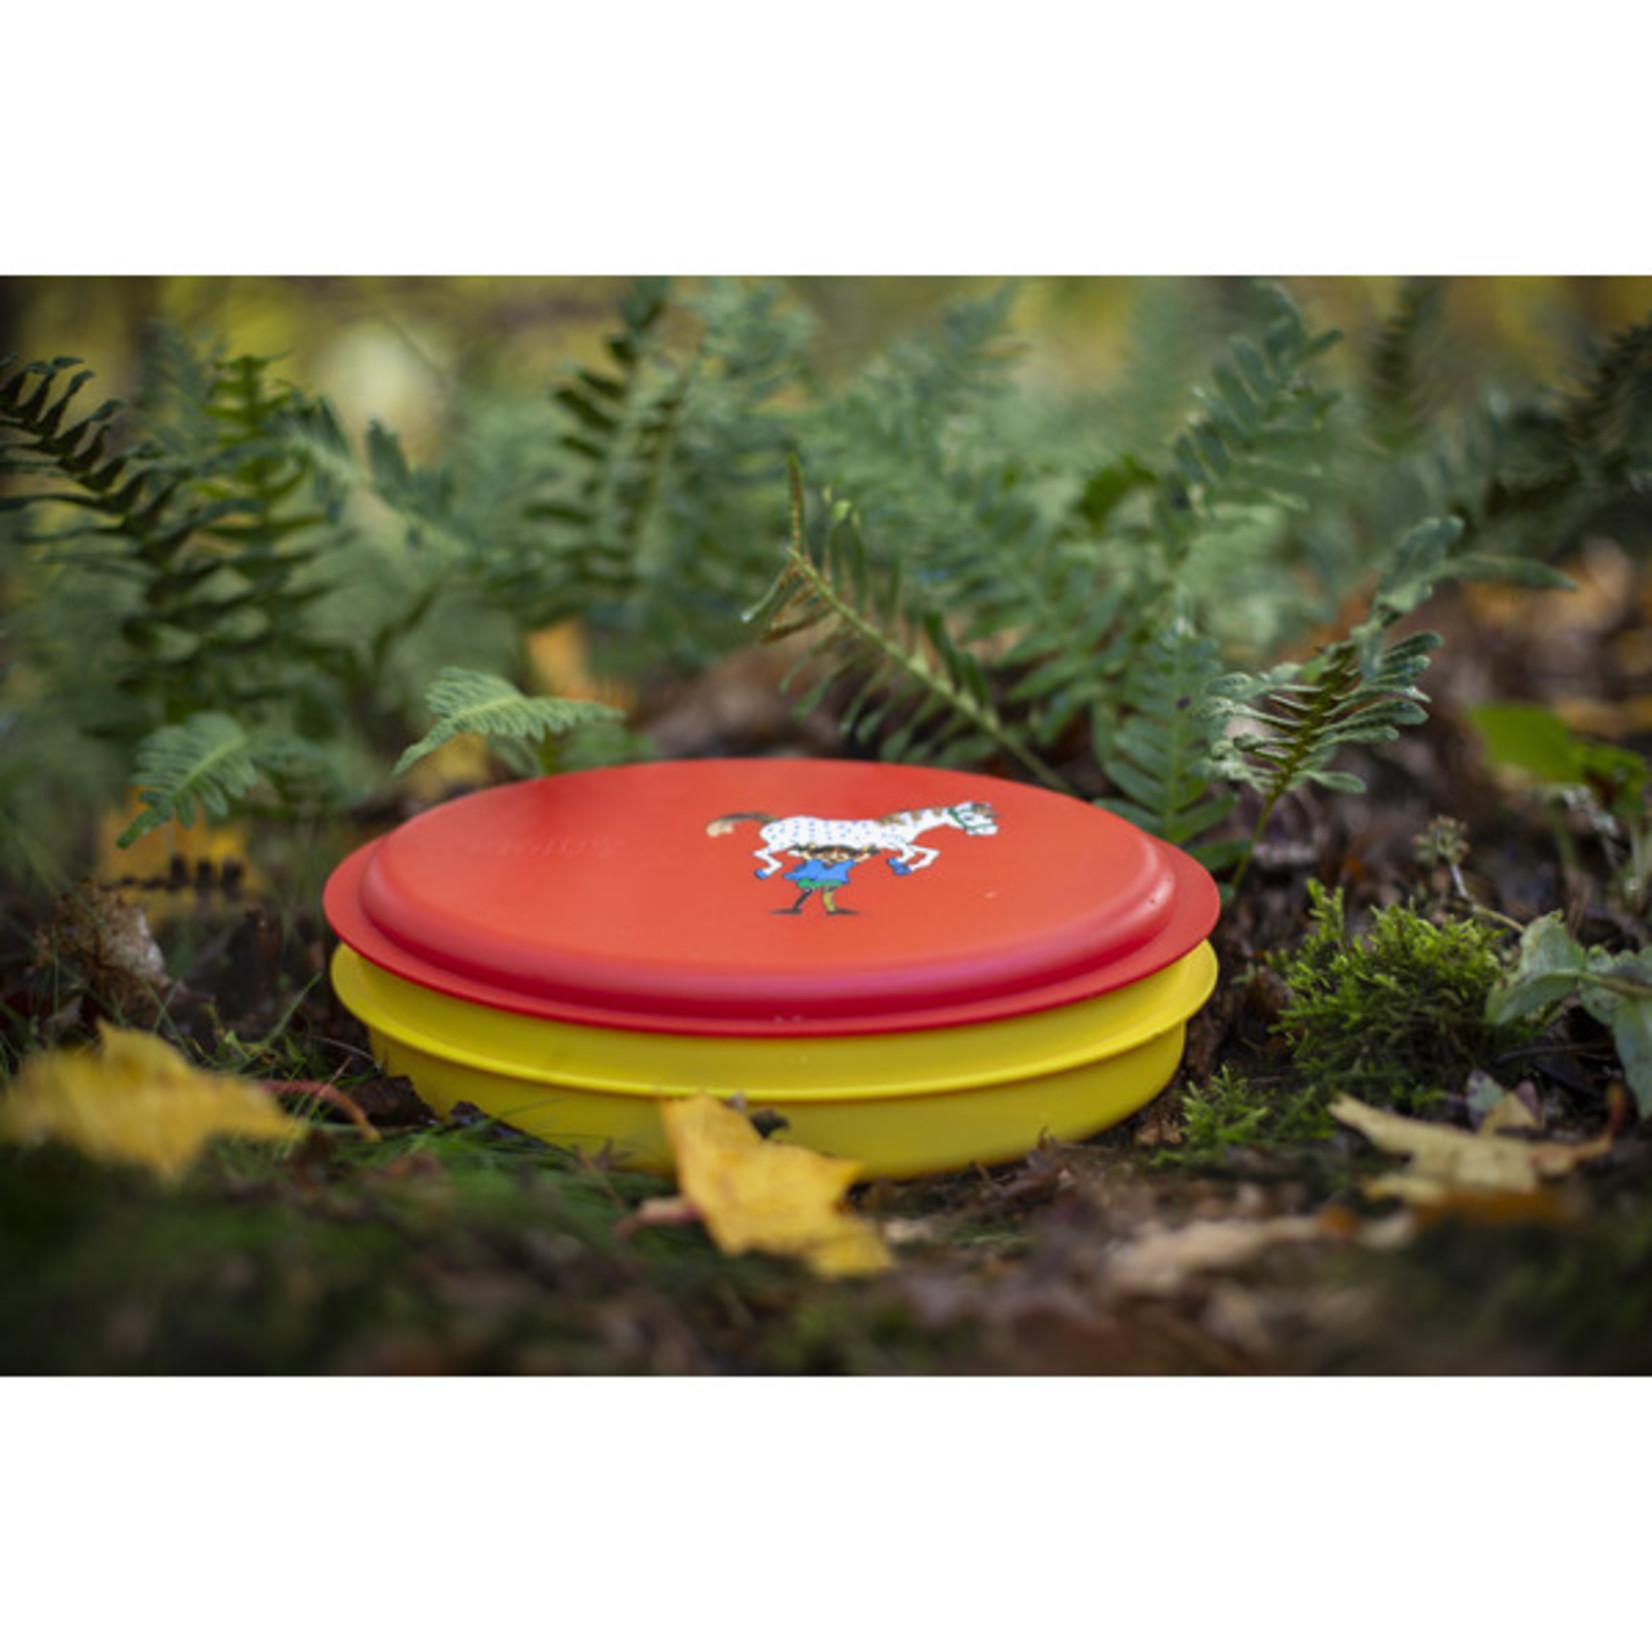 Primus Primus lunchbox Pippi Langkous 5-delig, rood